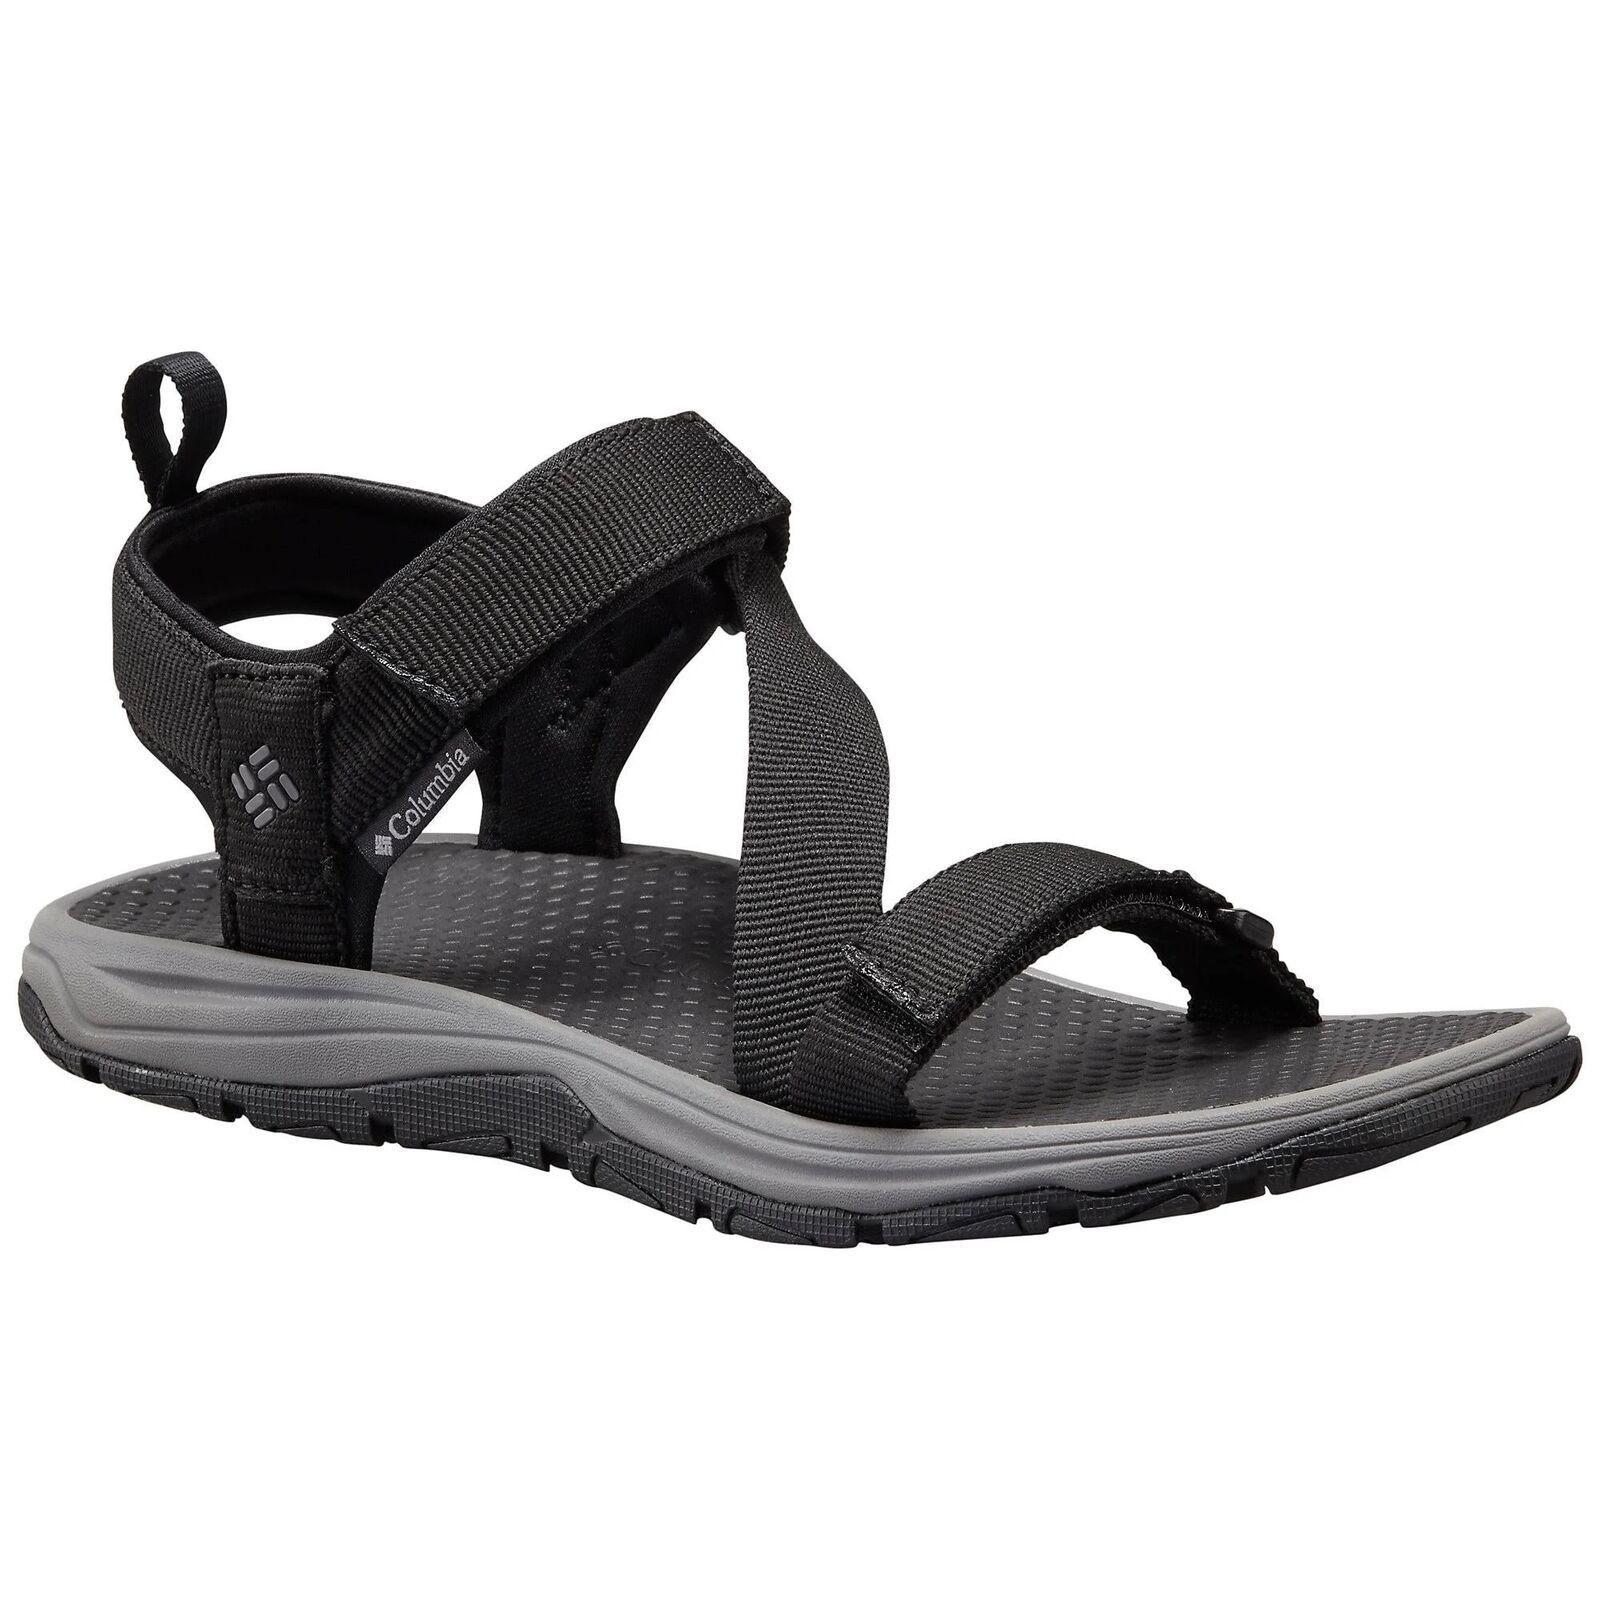 Columbia 1718431 010 Wave Train Black / City Grey Men's Sandals